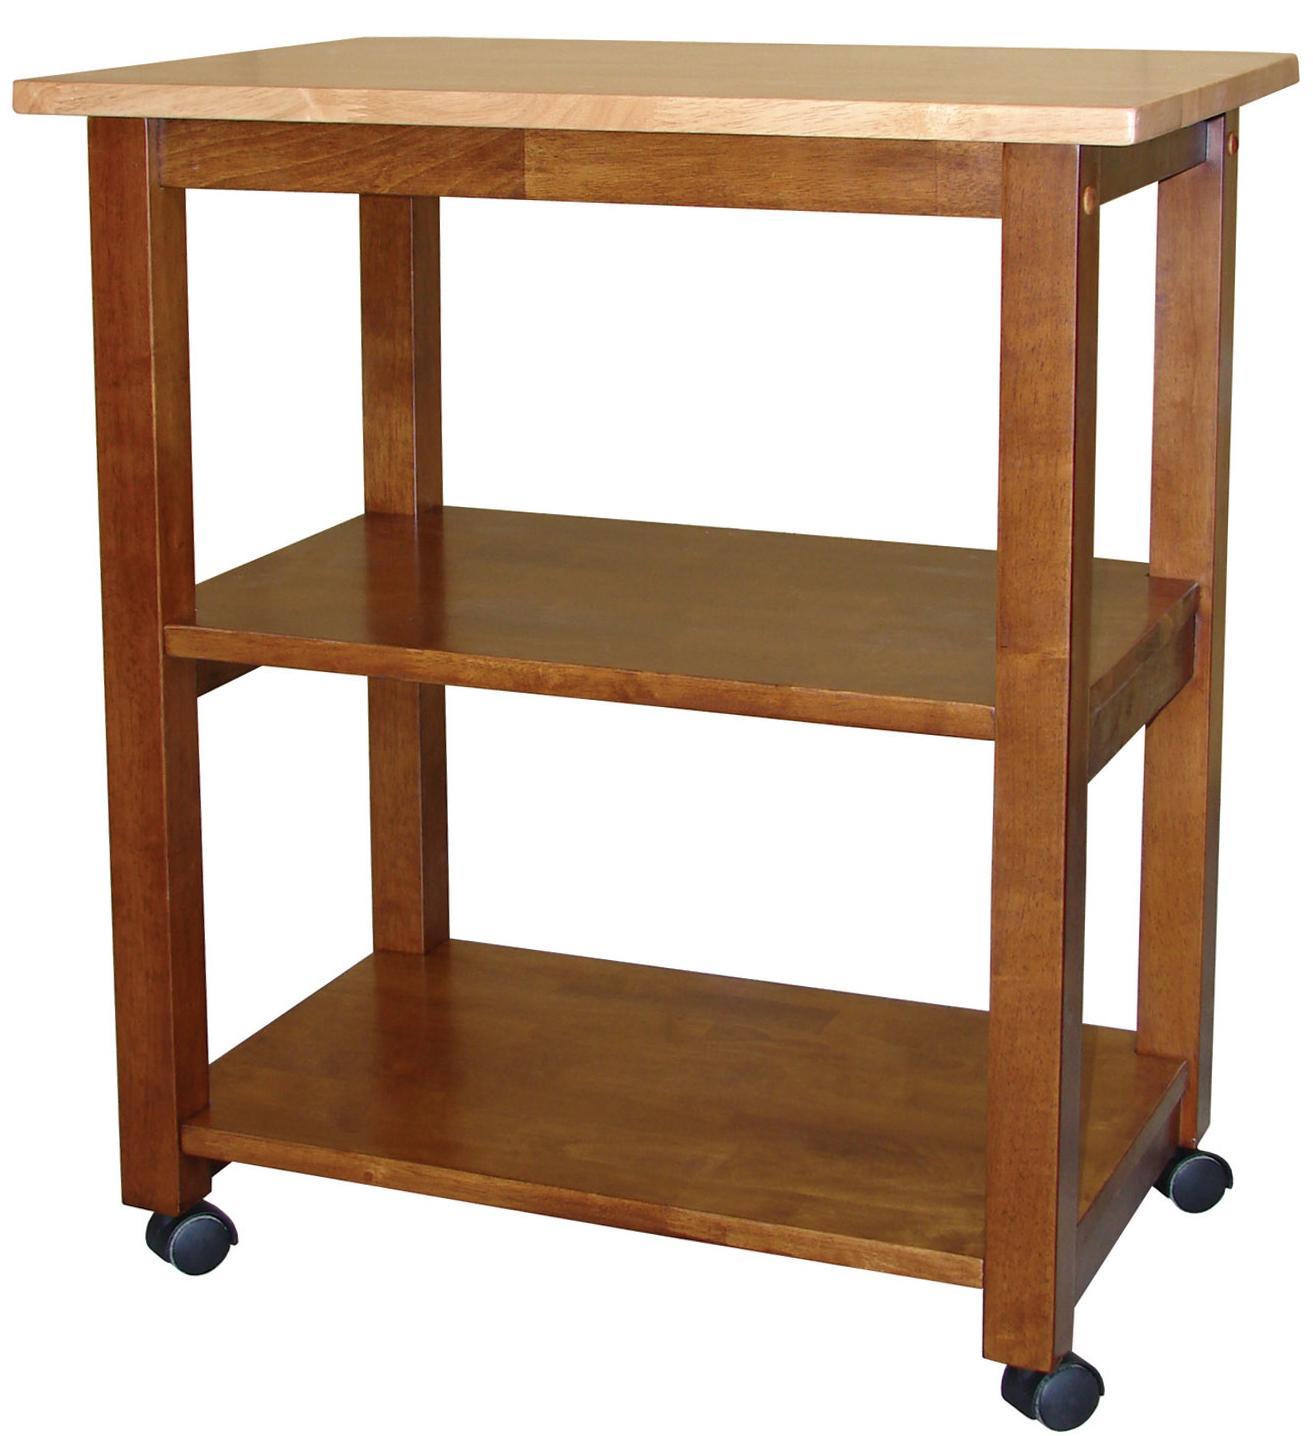 John Thomas Dining Essentials 2-Shelf Kitchen Cart - Item Number: WC58-185